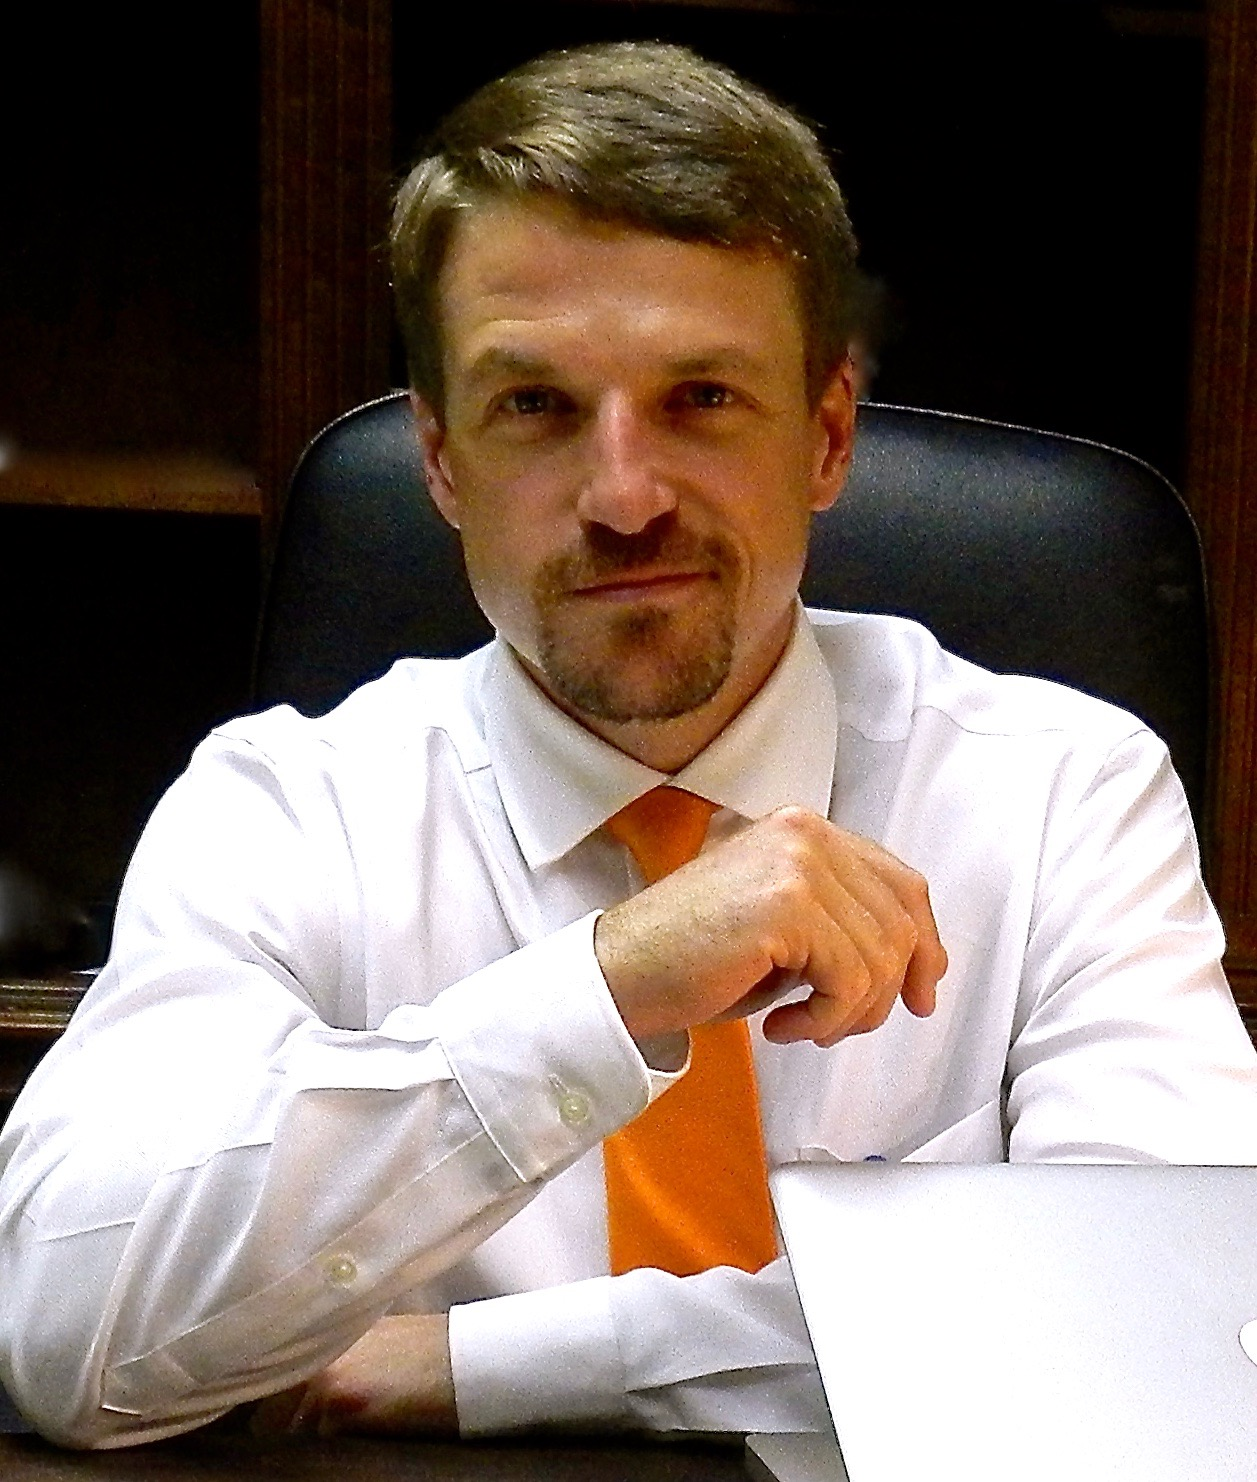 C. Austin McDaniel, Attorney at Law